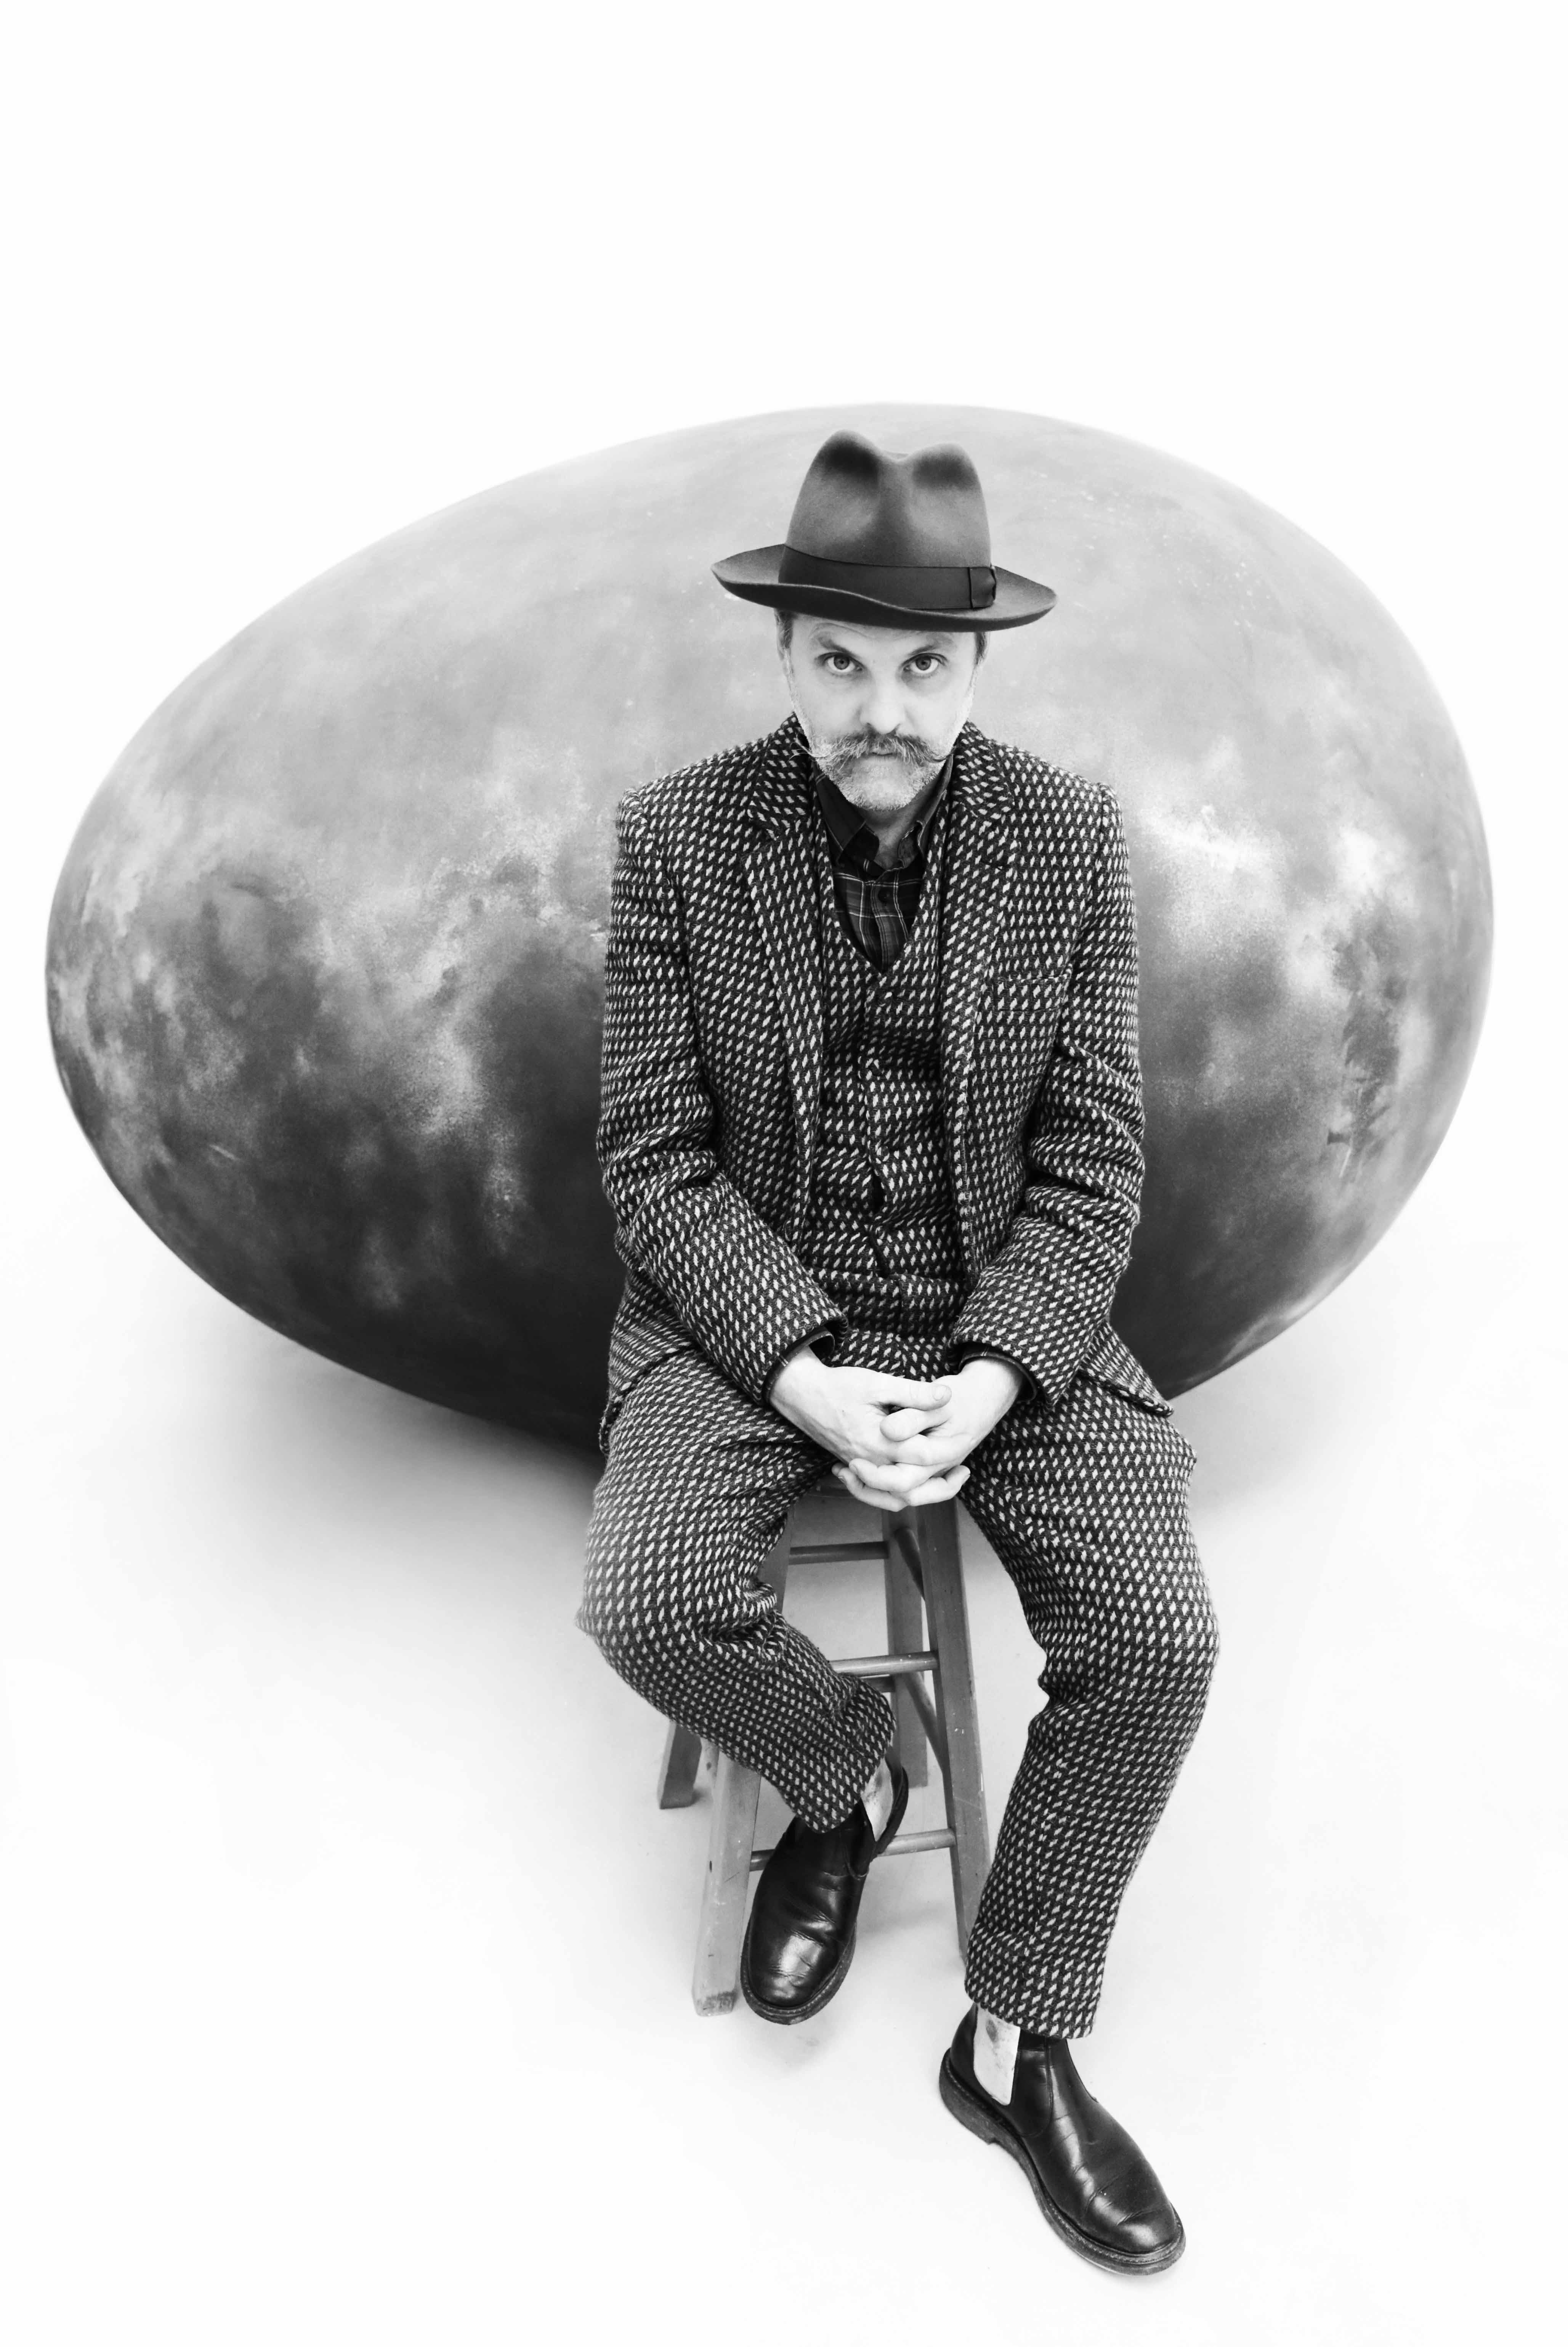 Portrait of artist Gavin Turk